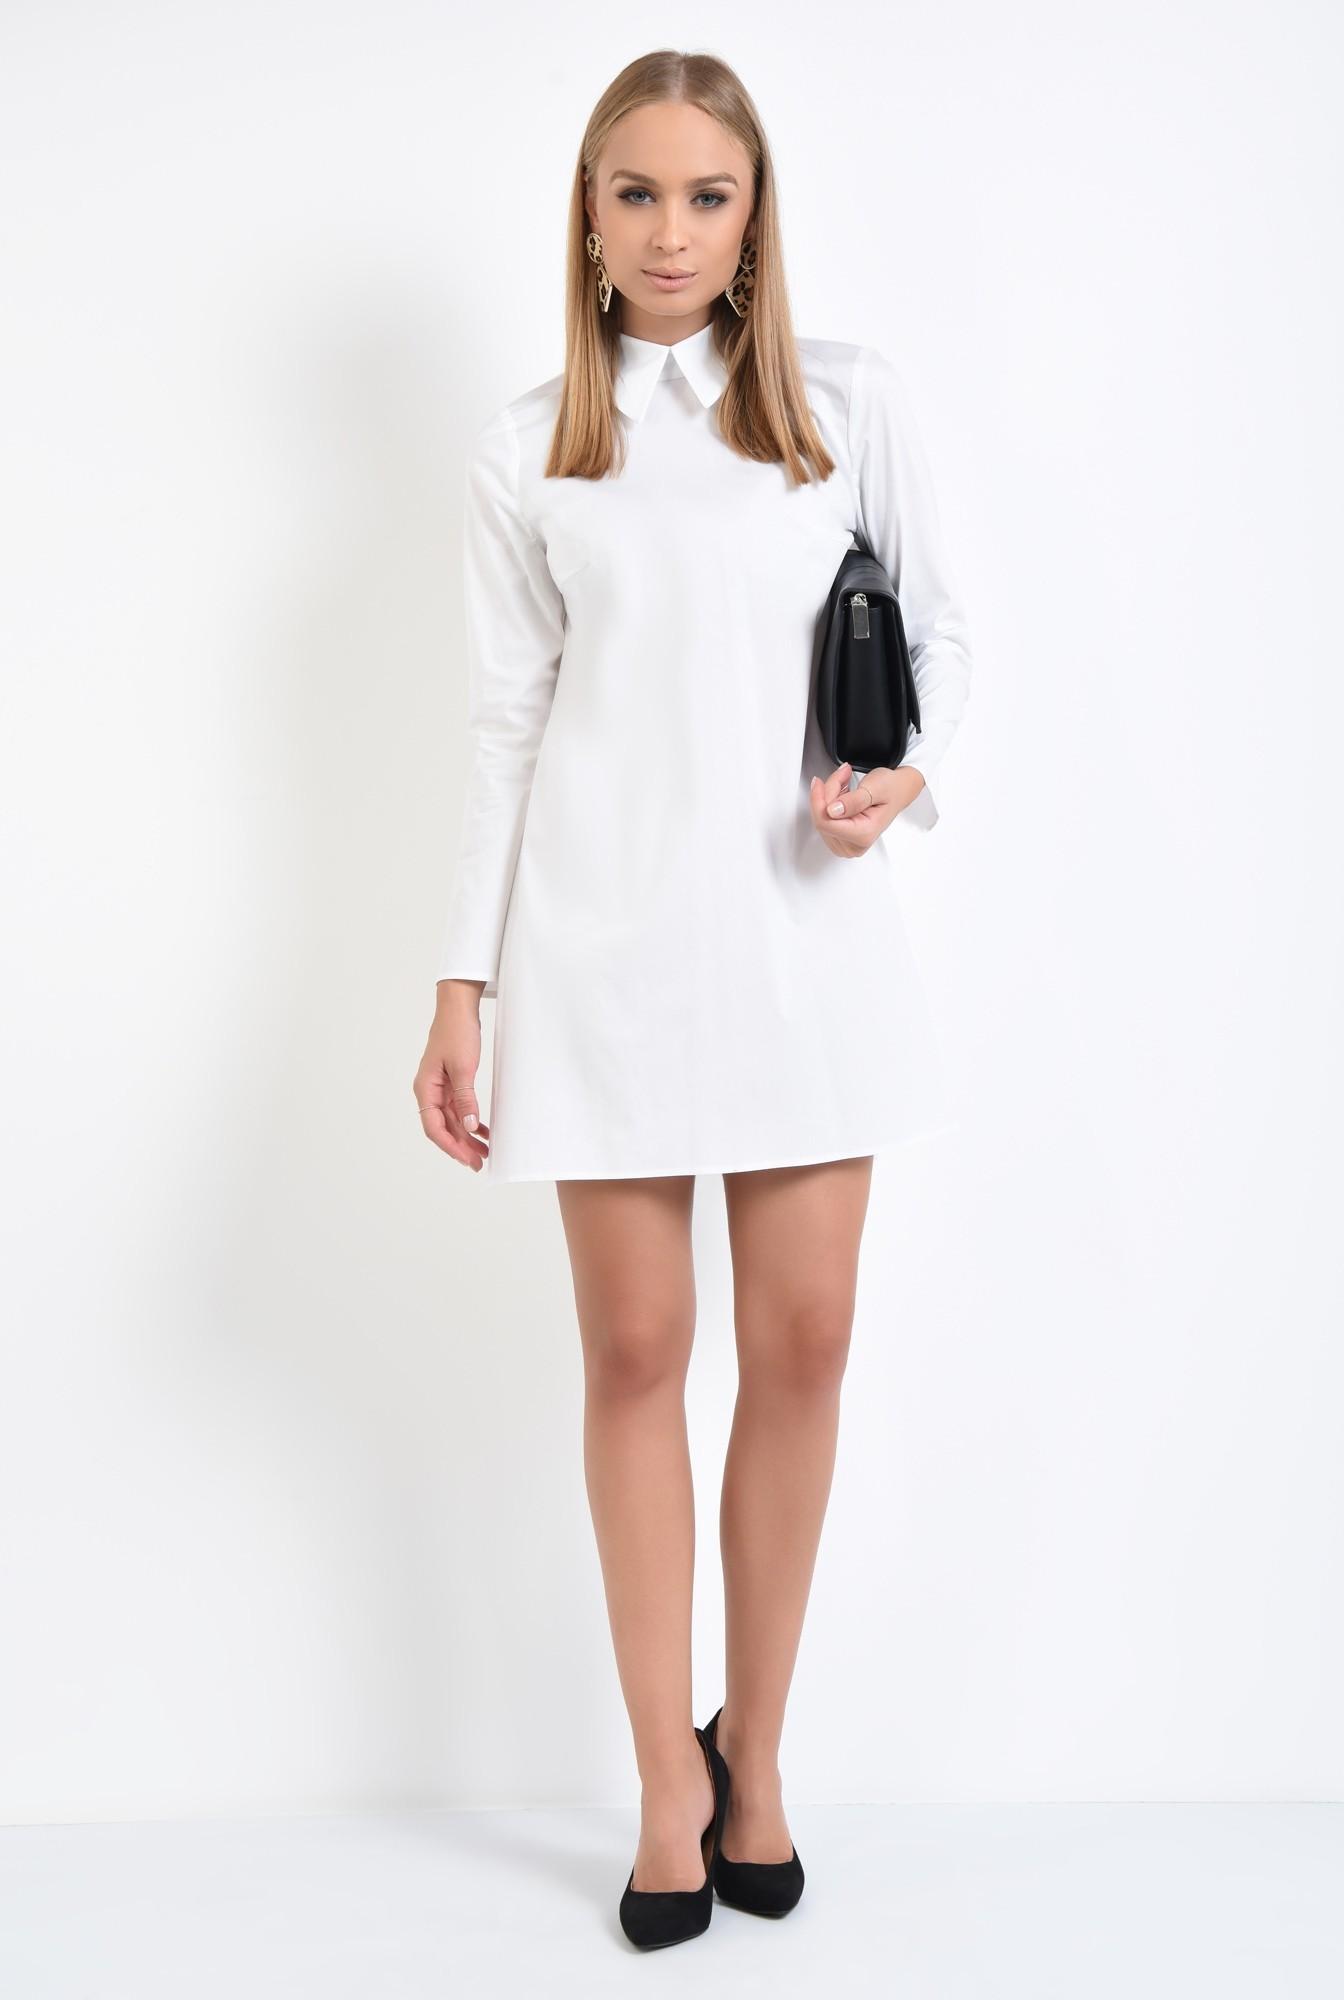 3 - rochie casual, croi lejer, pliuri, guler aplicat, stil camasa